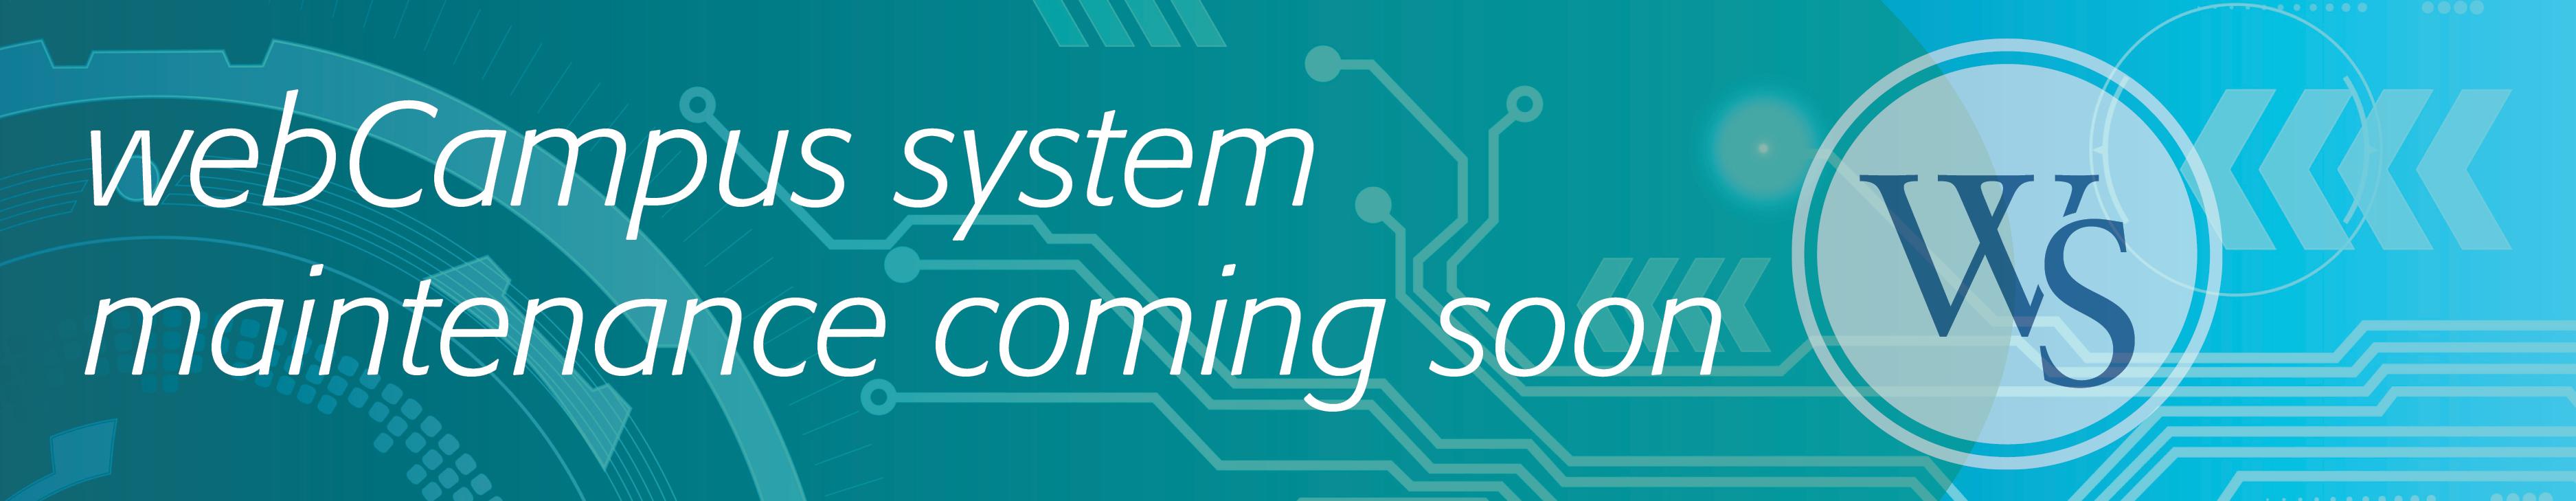 webCampus System Maintenance